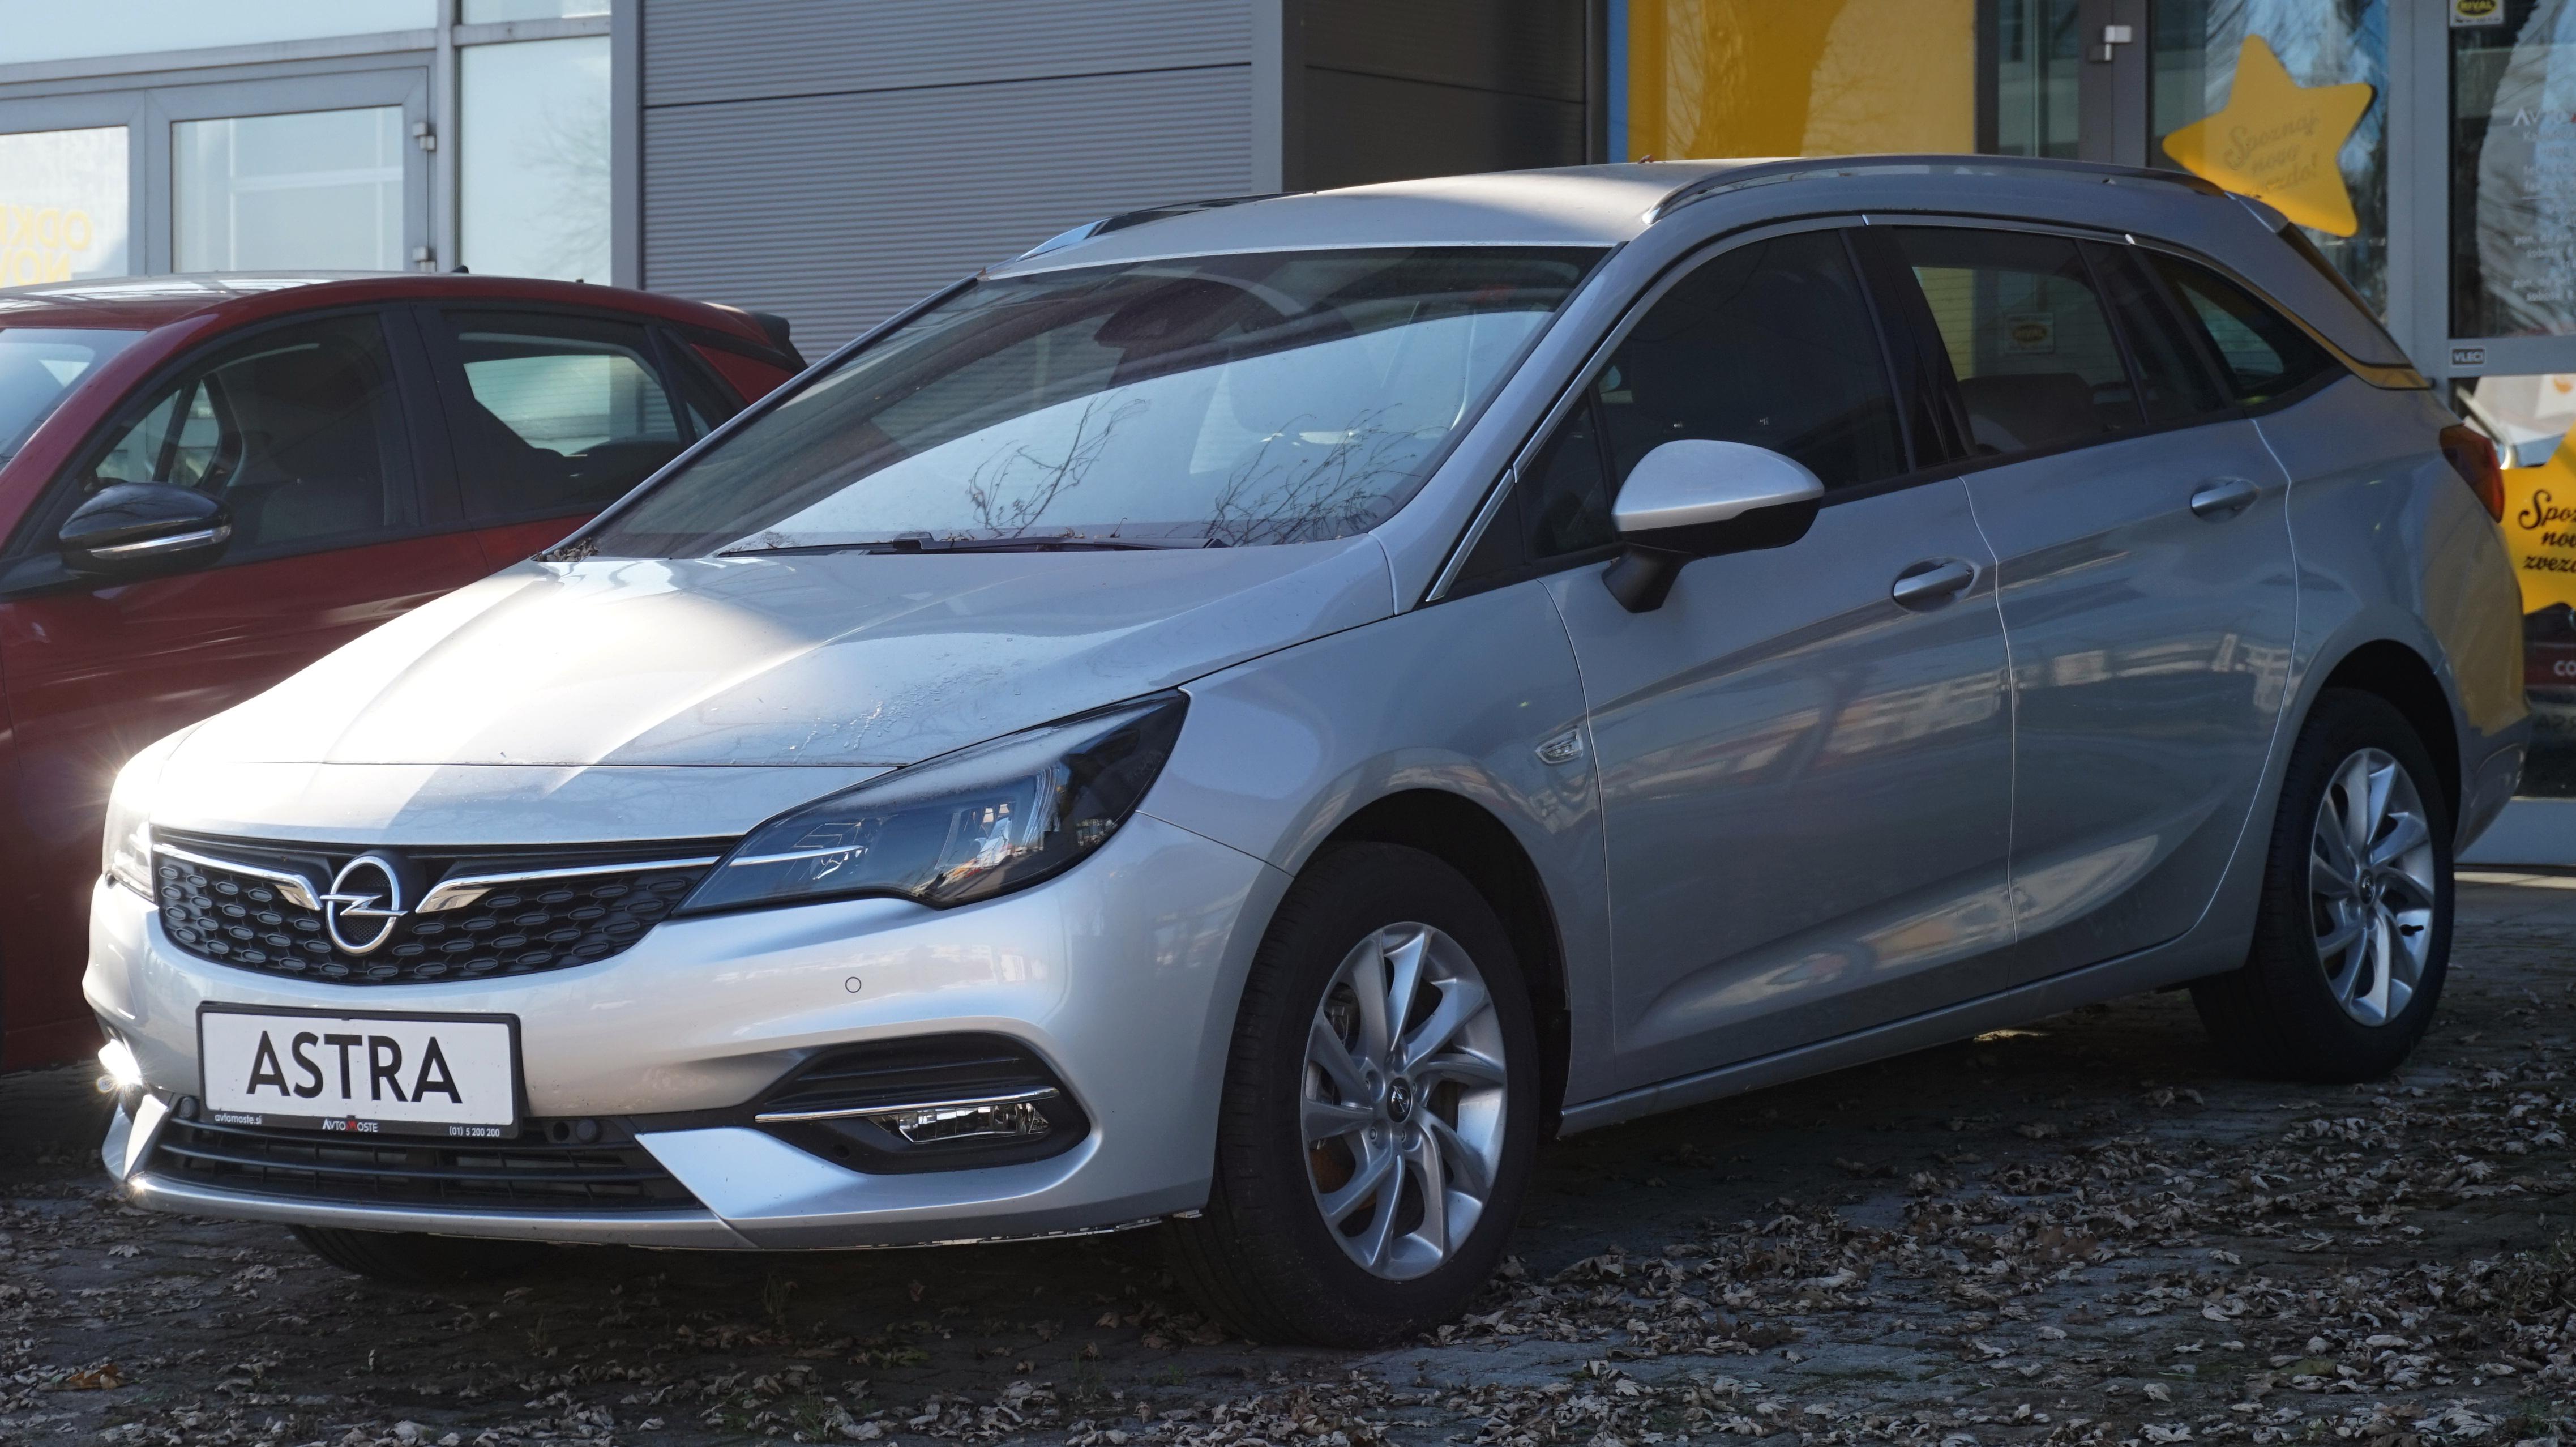 File Opel Astra K 2019 Jpg Wikimedia Commons